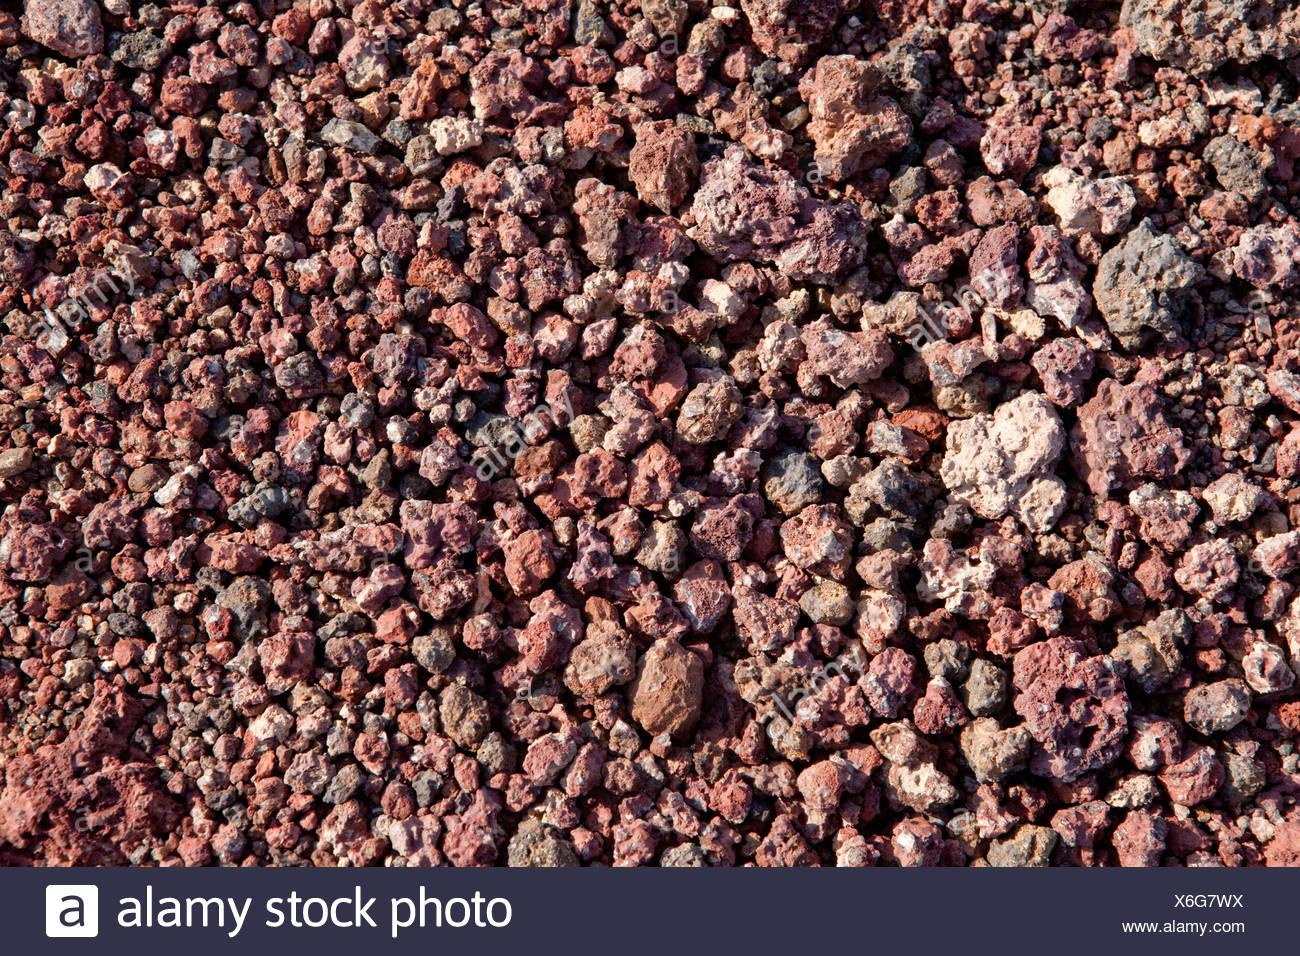 Volcanical, rock, Ardoukoba, Assal, África, estructura, Djibouti, Imagen De Stock